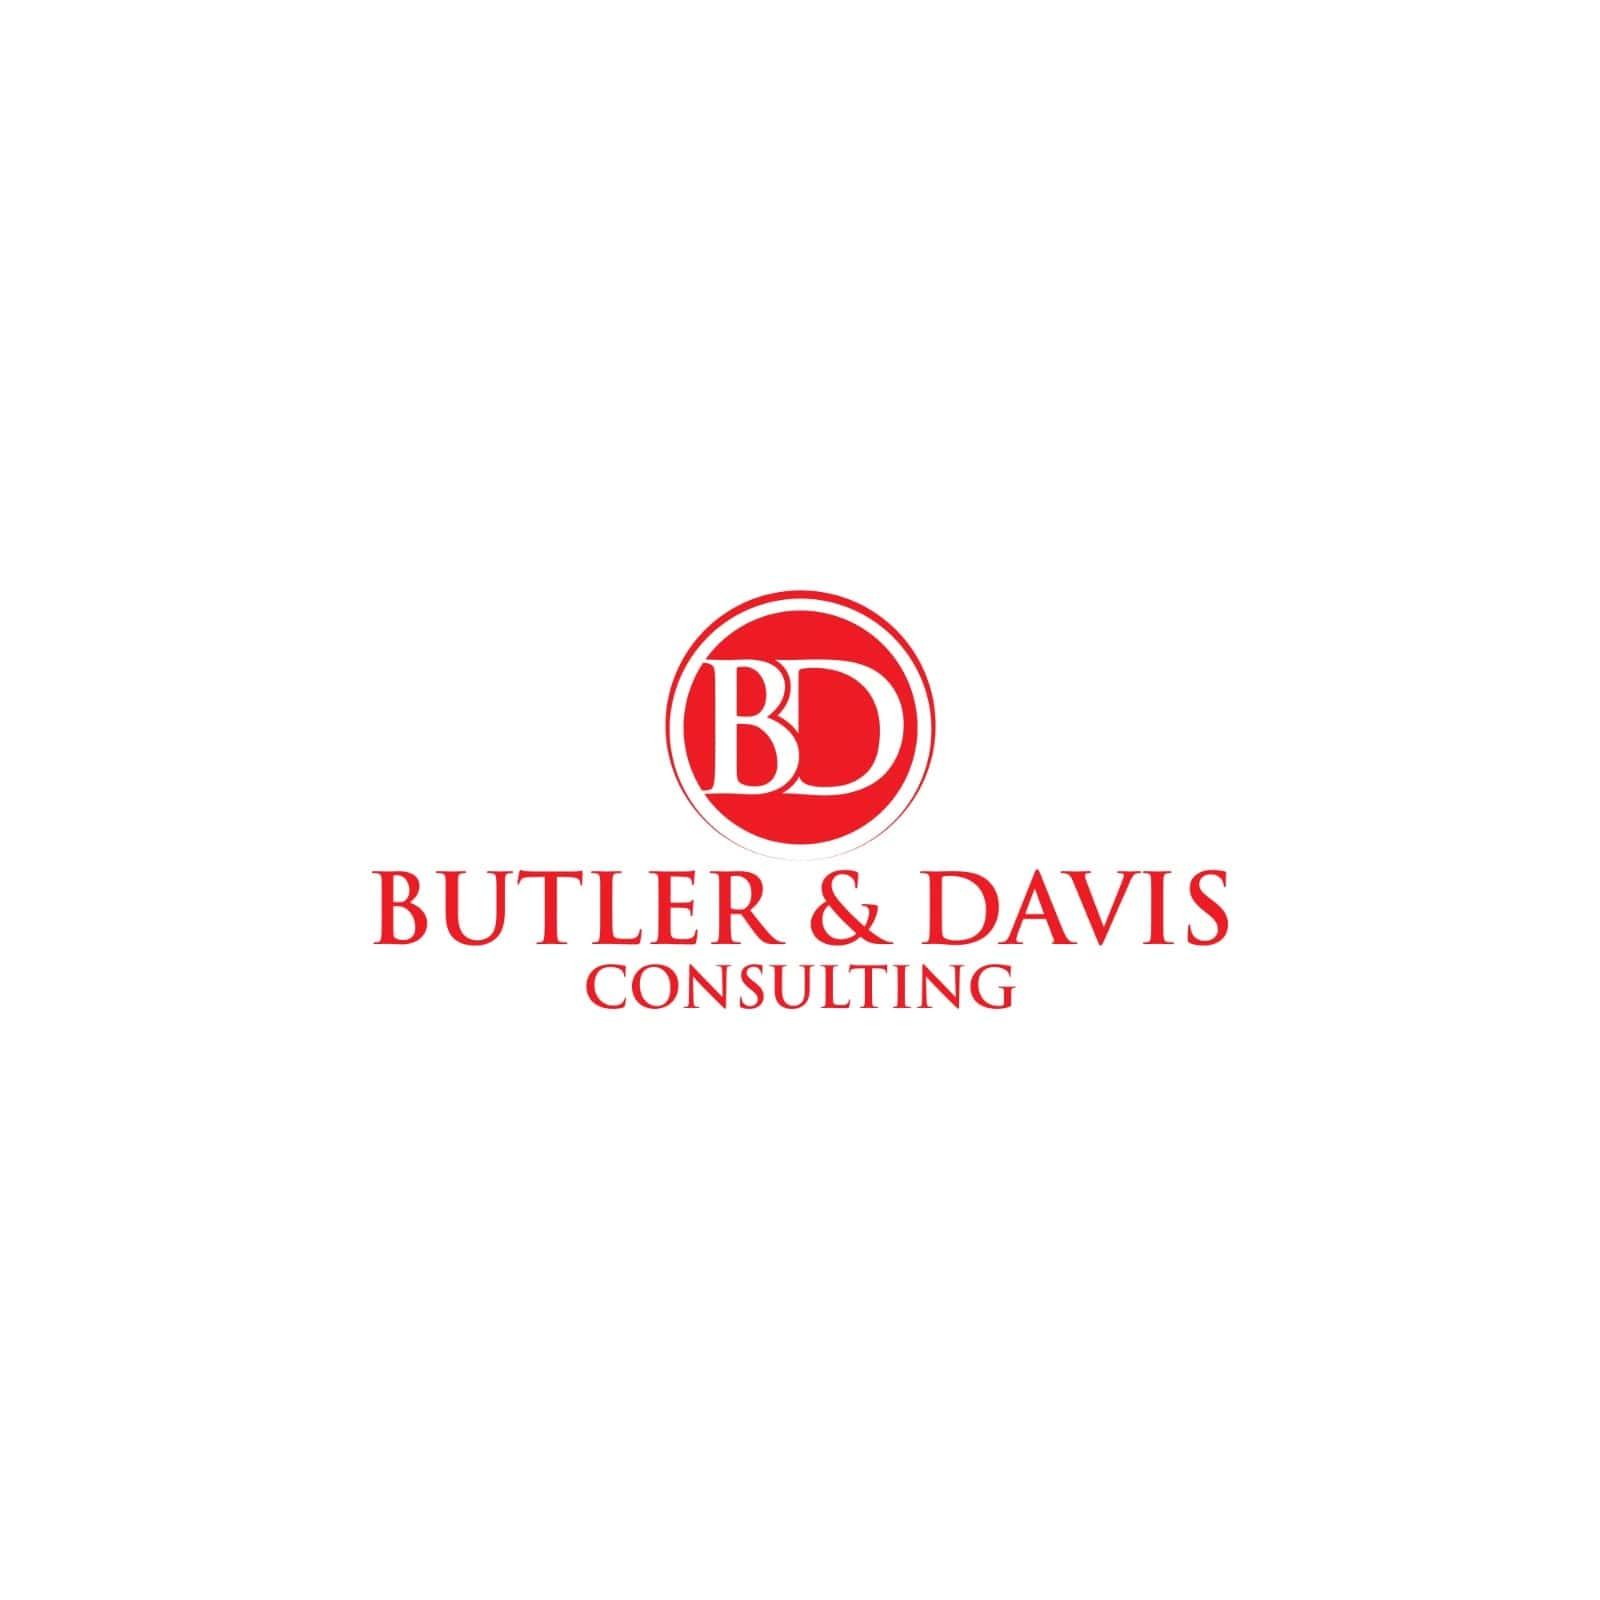 Butler & Davis Consulting LLC